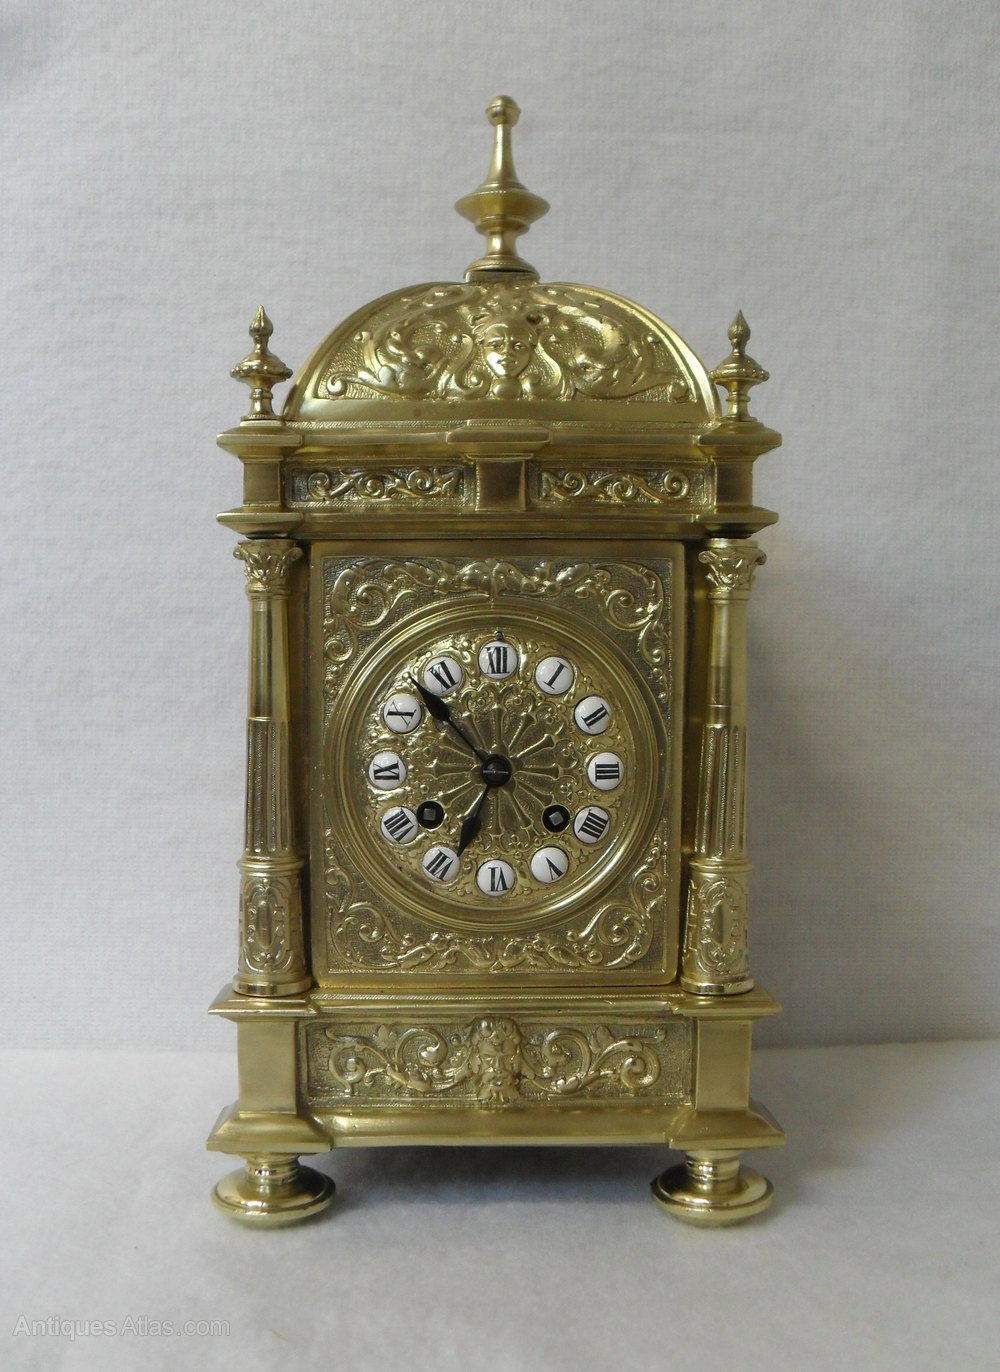 Antiques Atlas - French Brass Mantel Clock